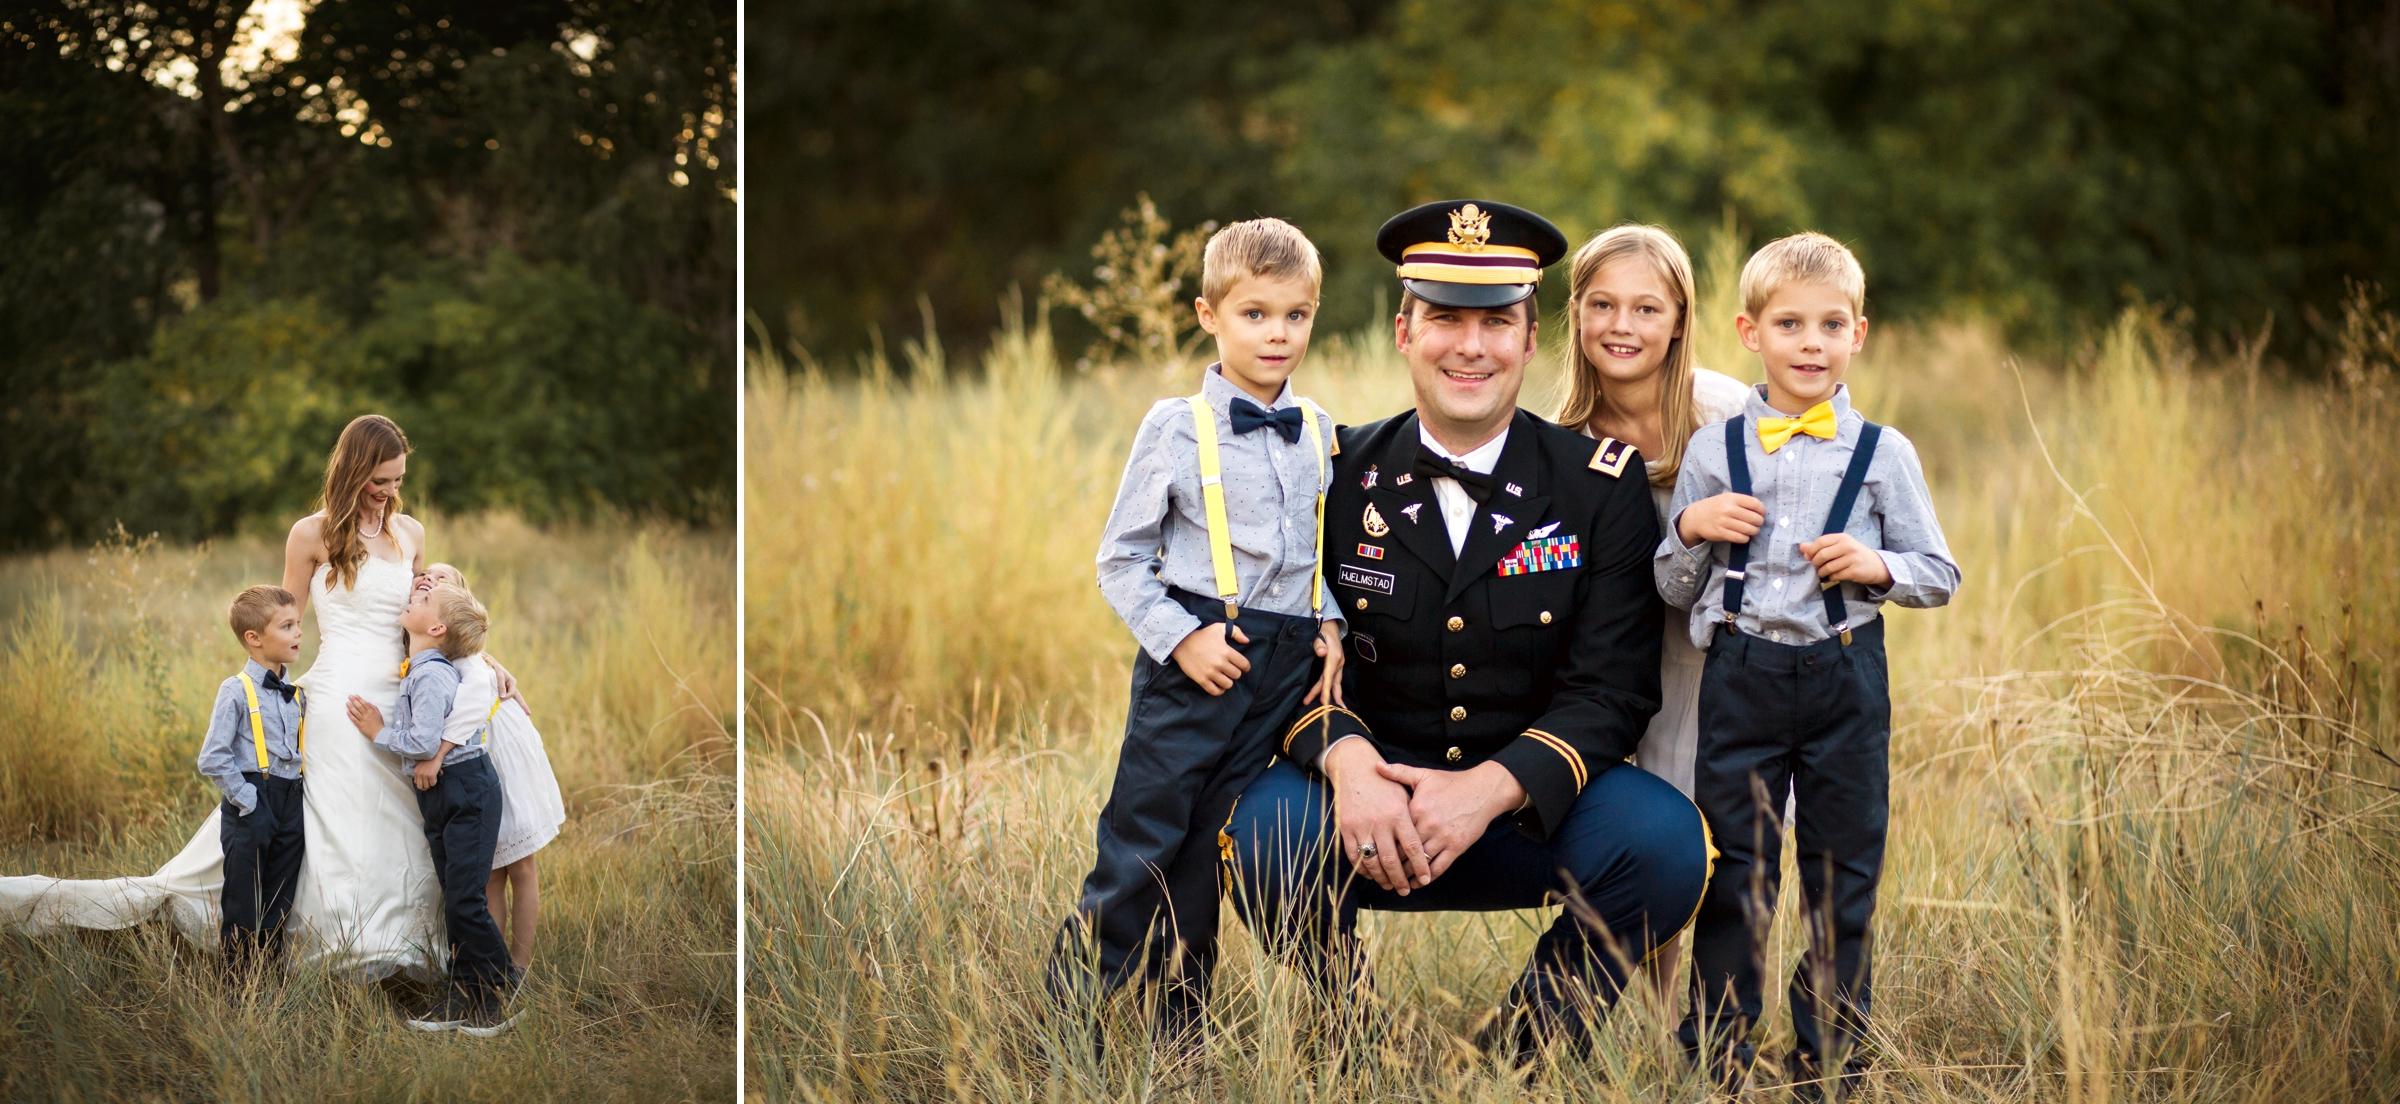 best family photographer, outdoor family photographer